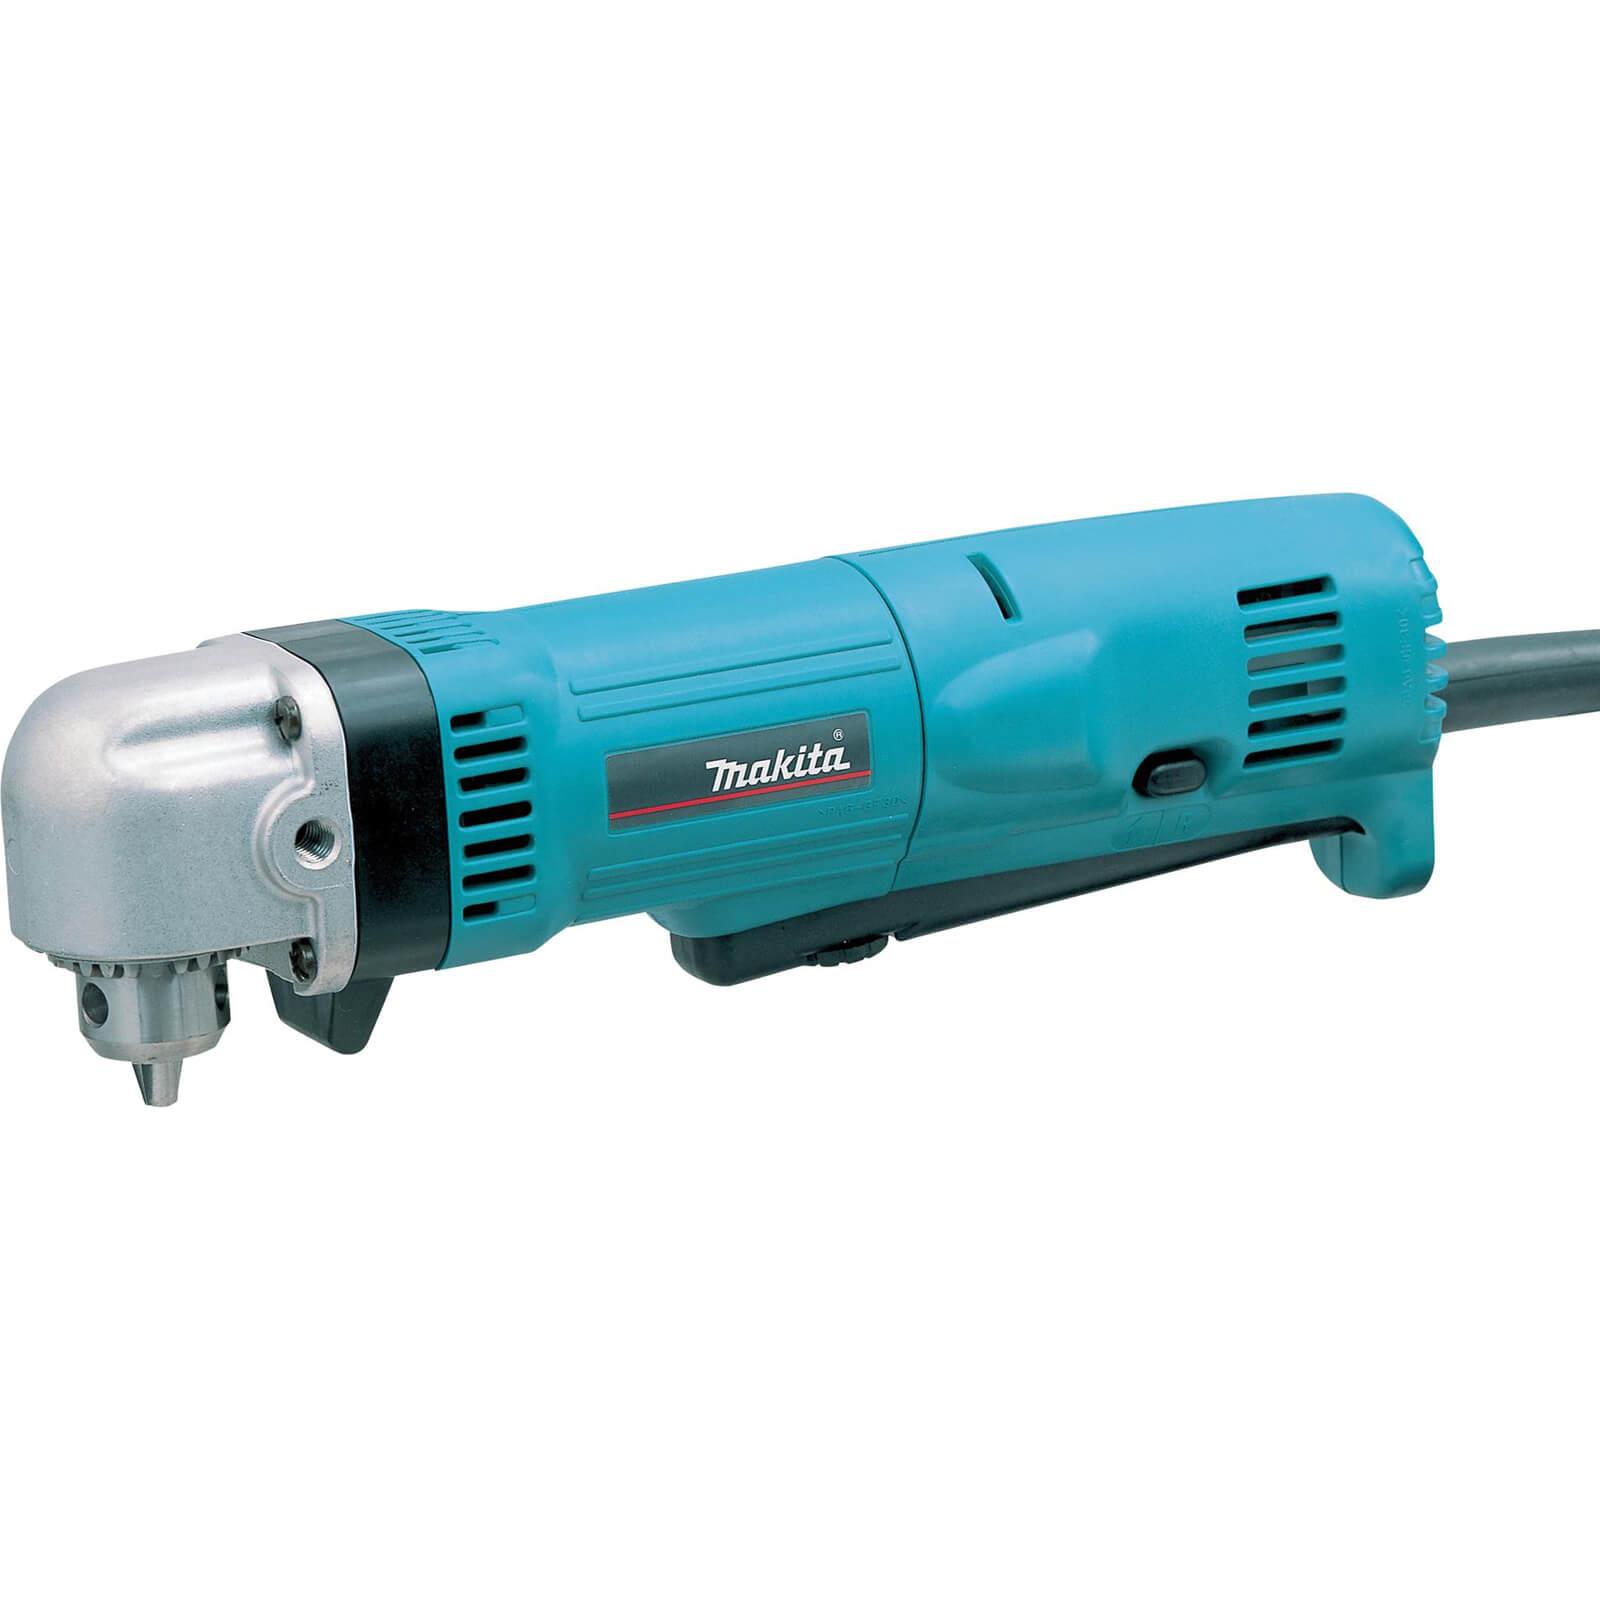 Image of Makita DA3010 Angle Drill 240v